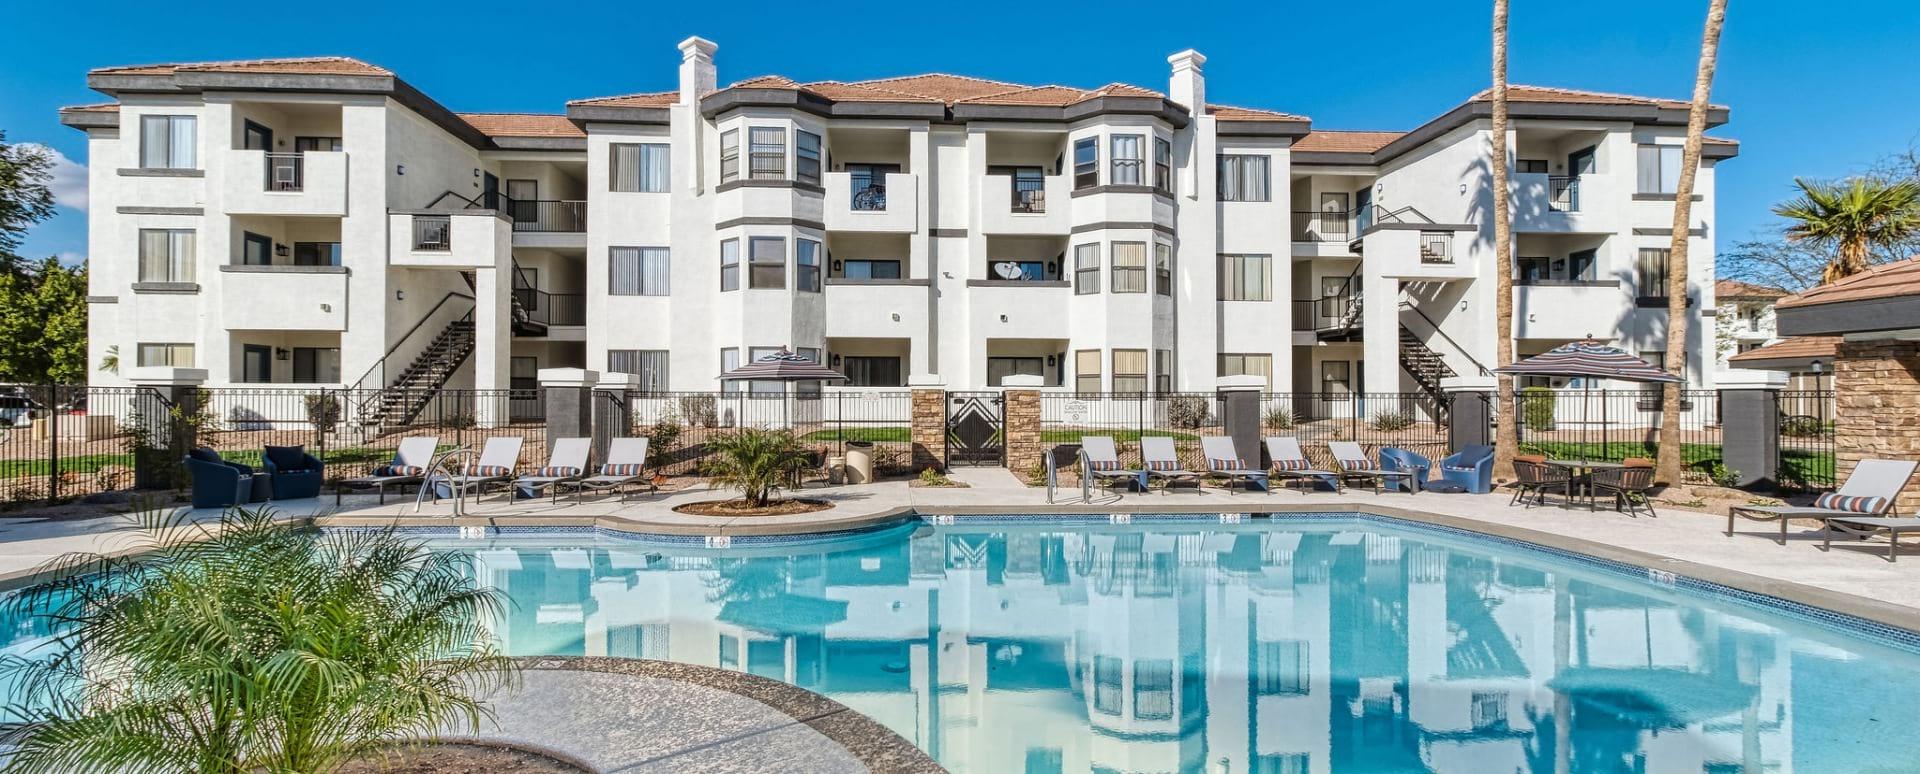 Cortland Red Mountain Apartments in Phoenix, AZ